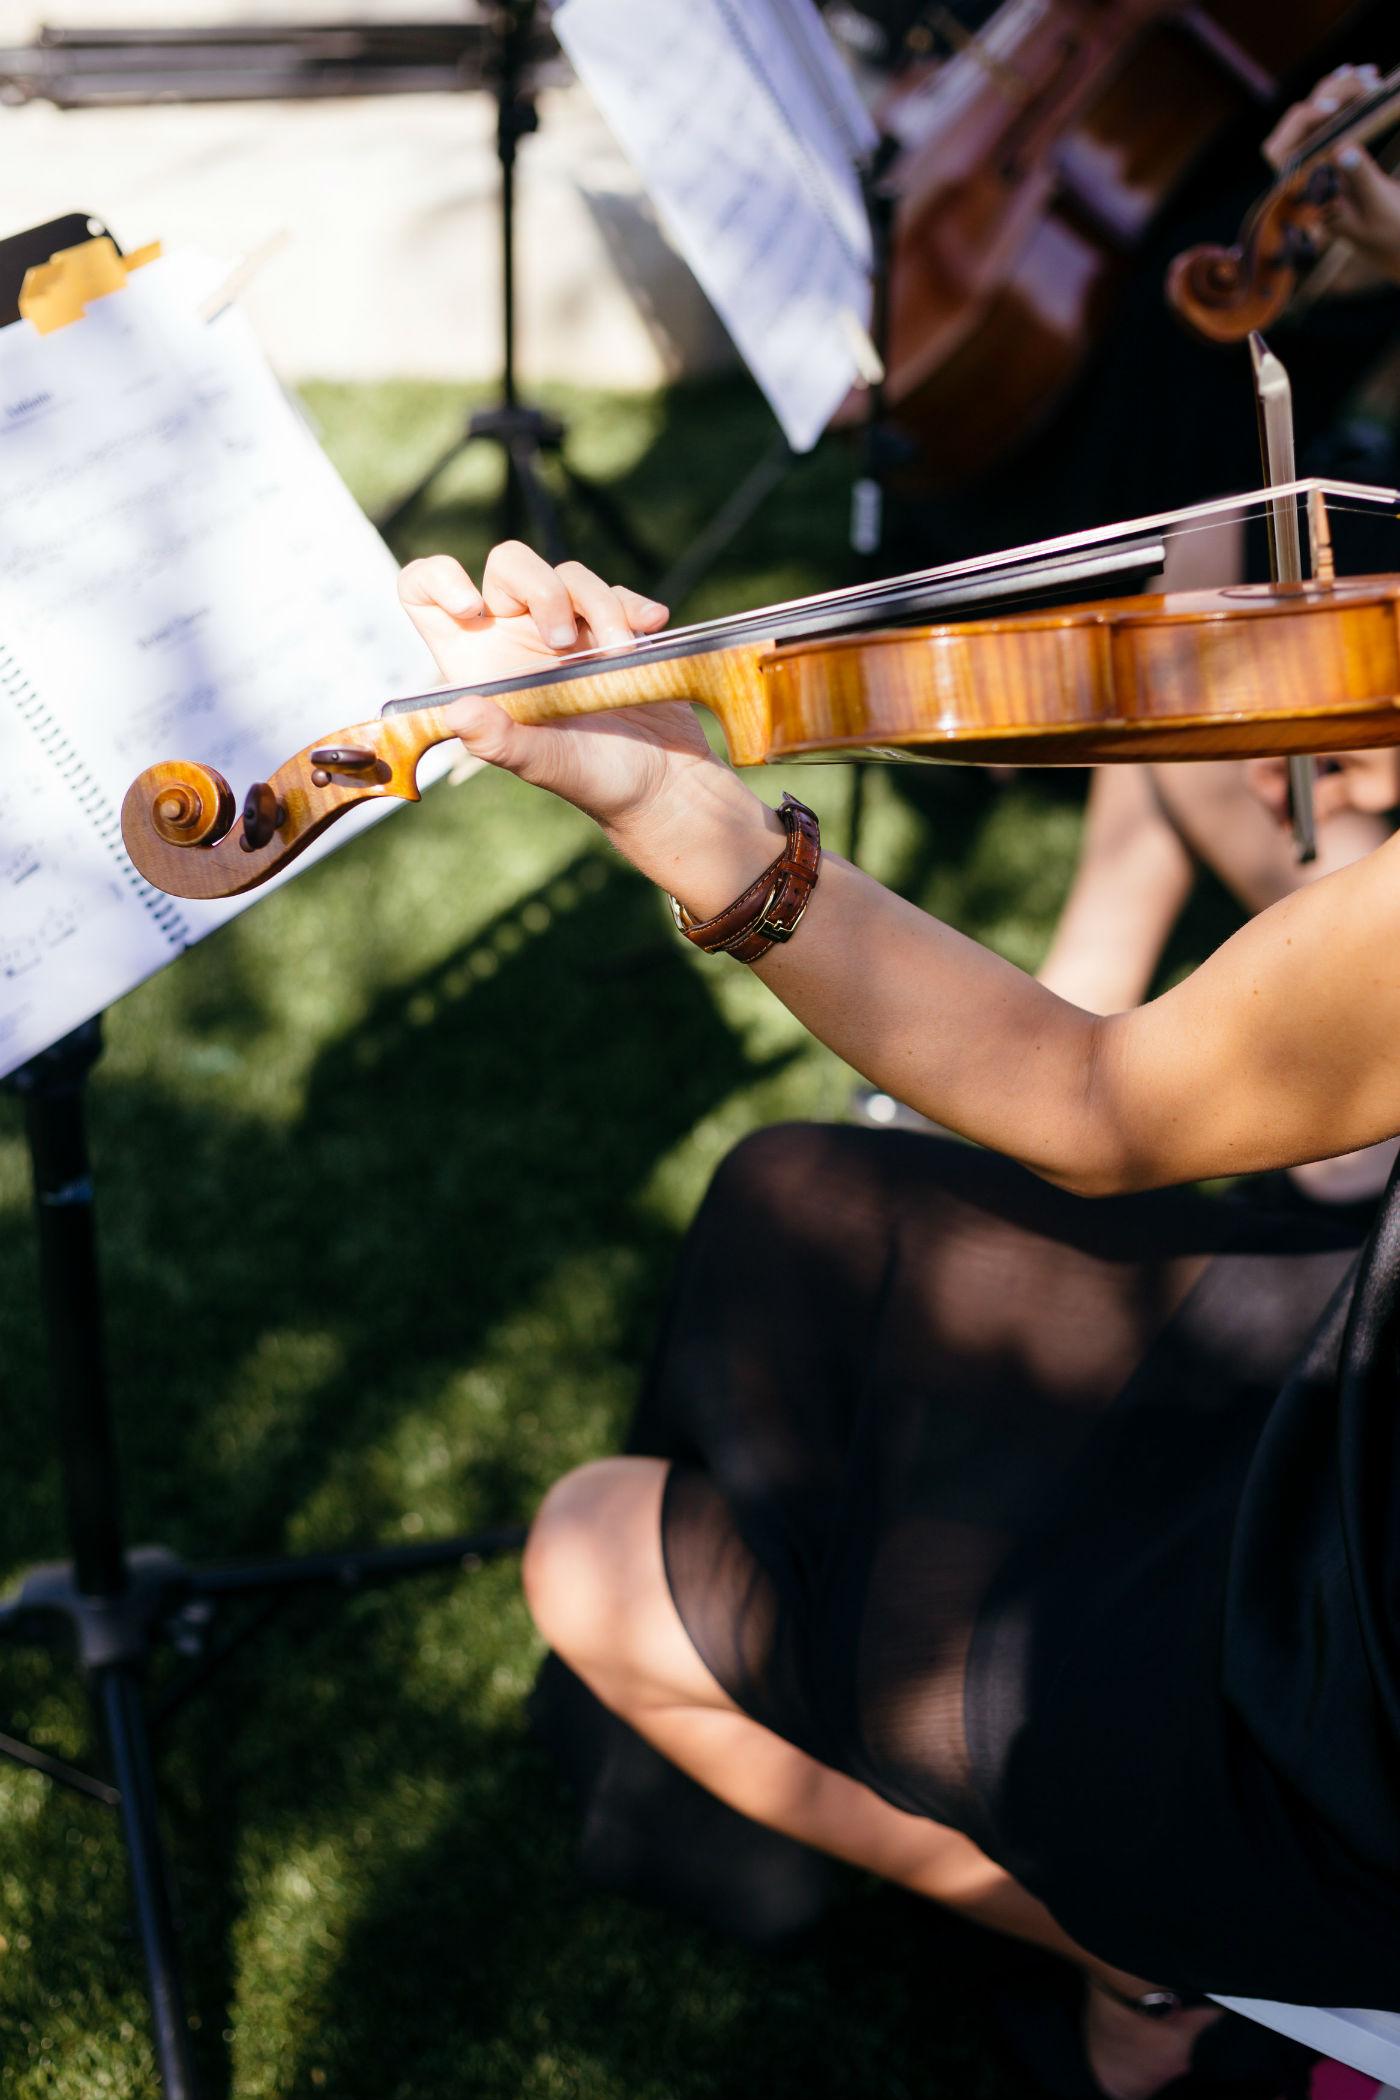 los-angeles-chicago-wedding-music-ceremony-strings-string-quartet-violin-cello-cocktial-musicians-mailbu-pacific-coast-strings-3.jpg